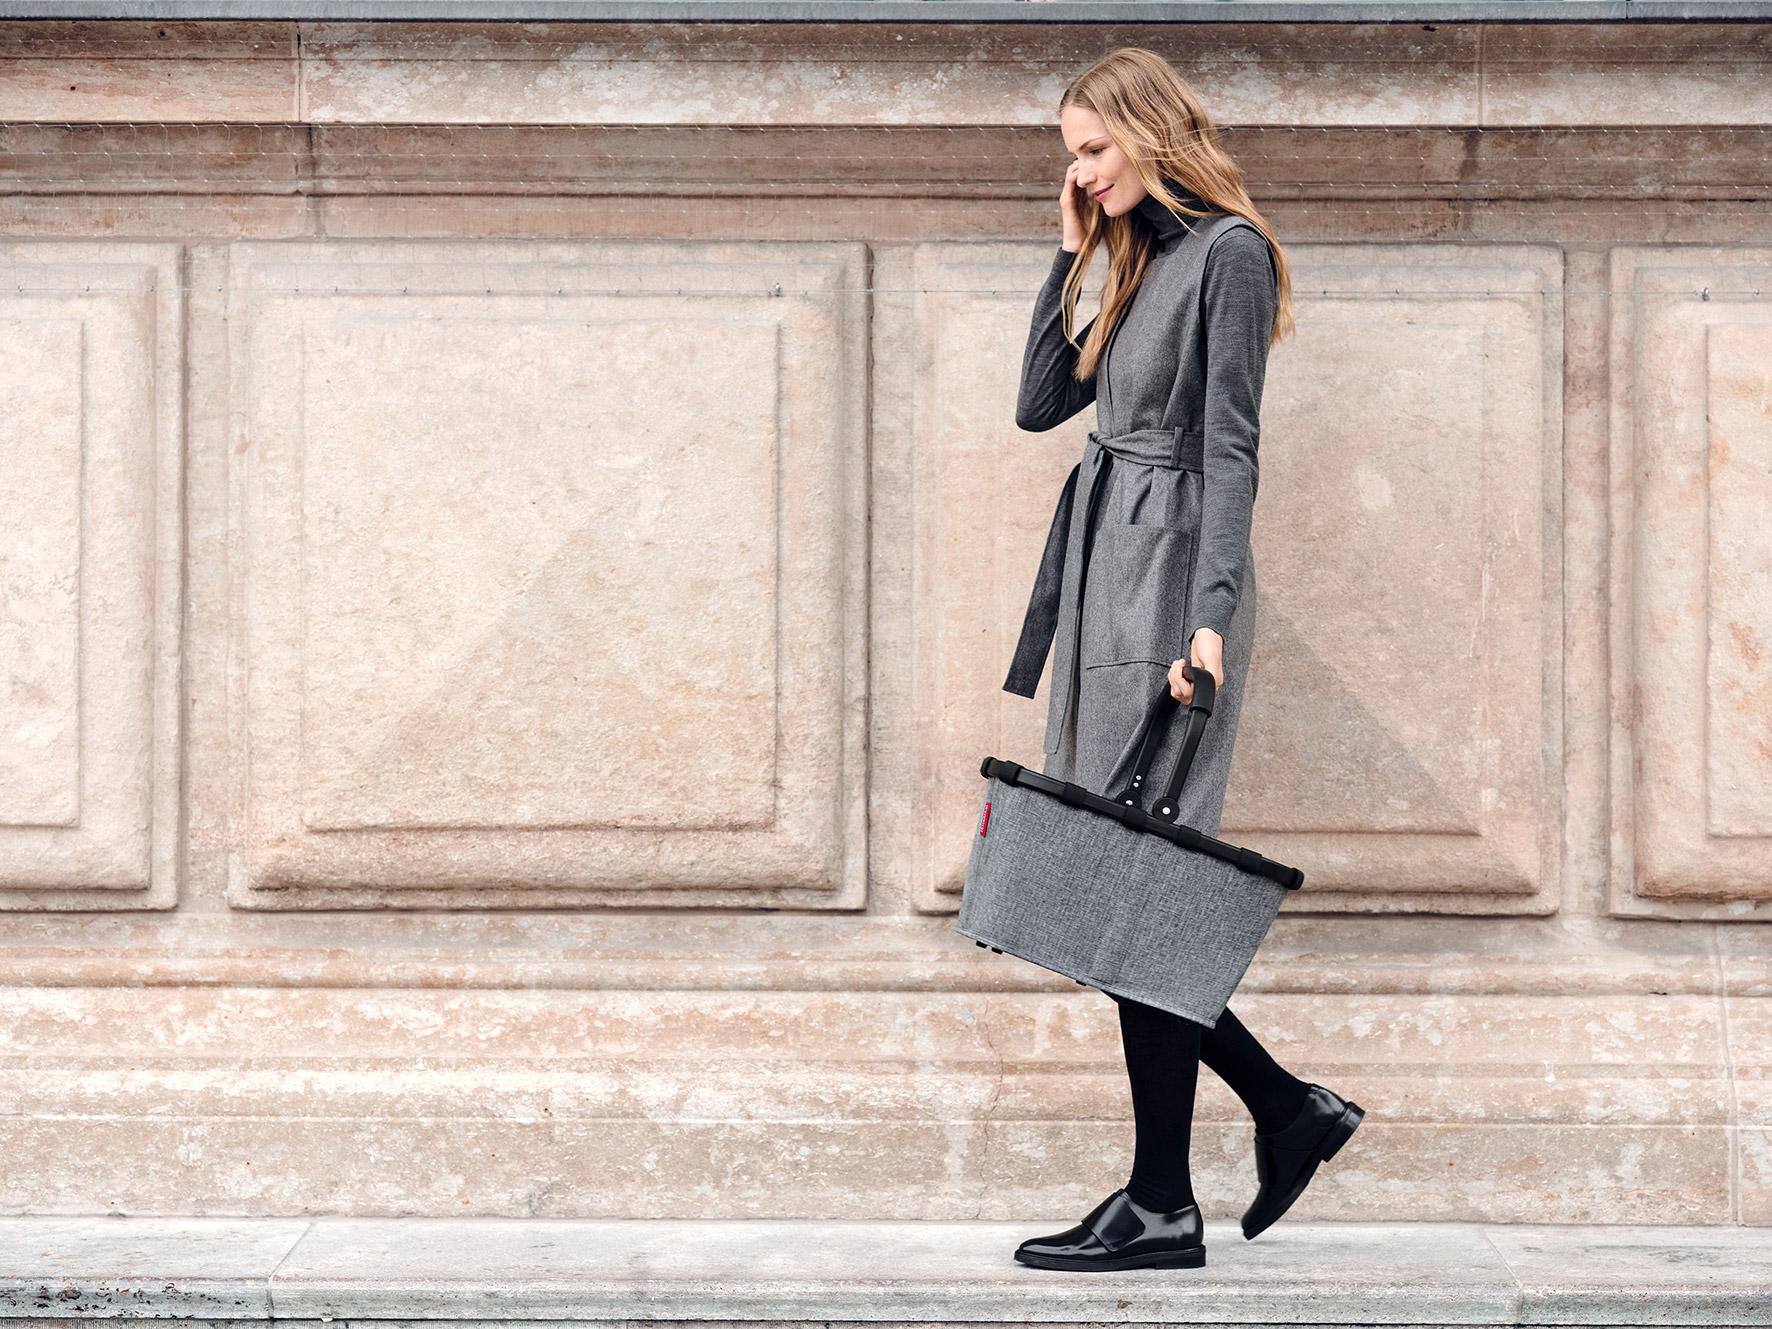 carrybag_twist-silver_reisenthel_Web_PE_02.jpg